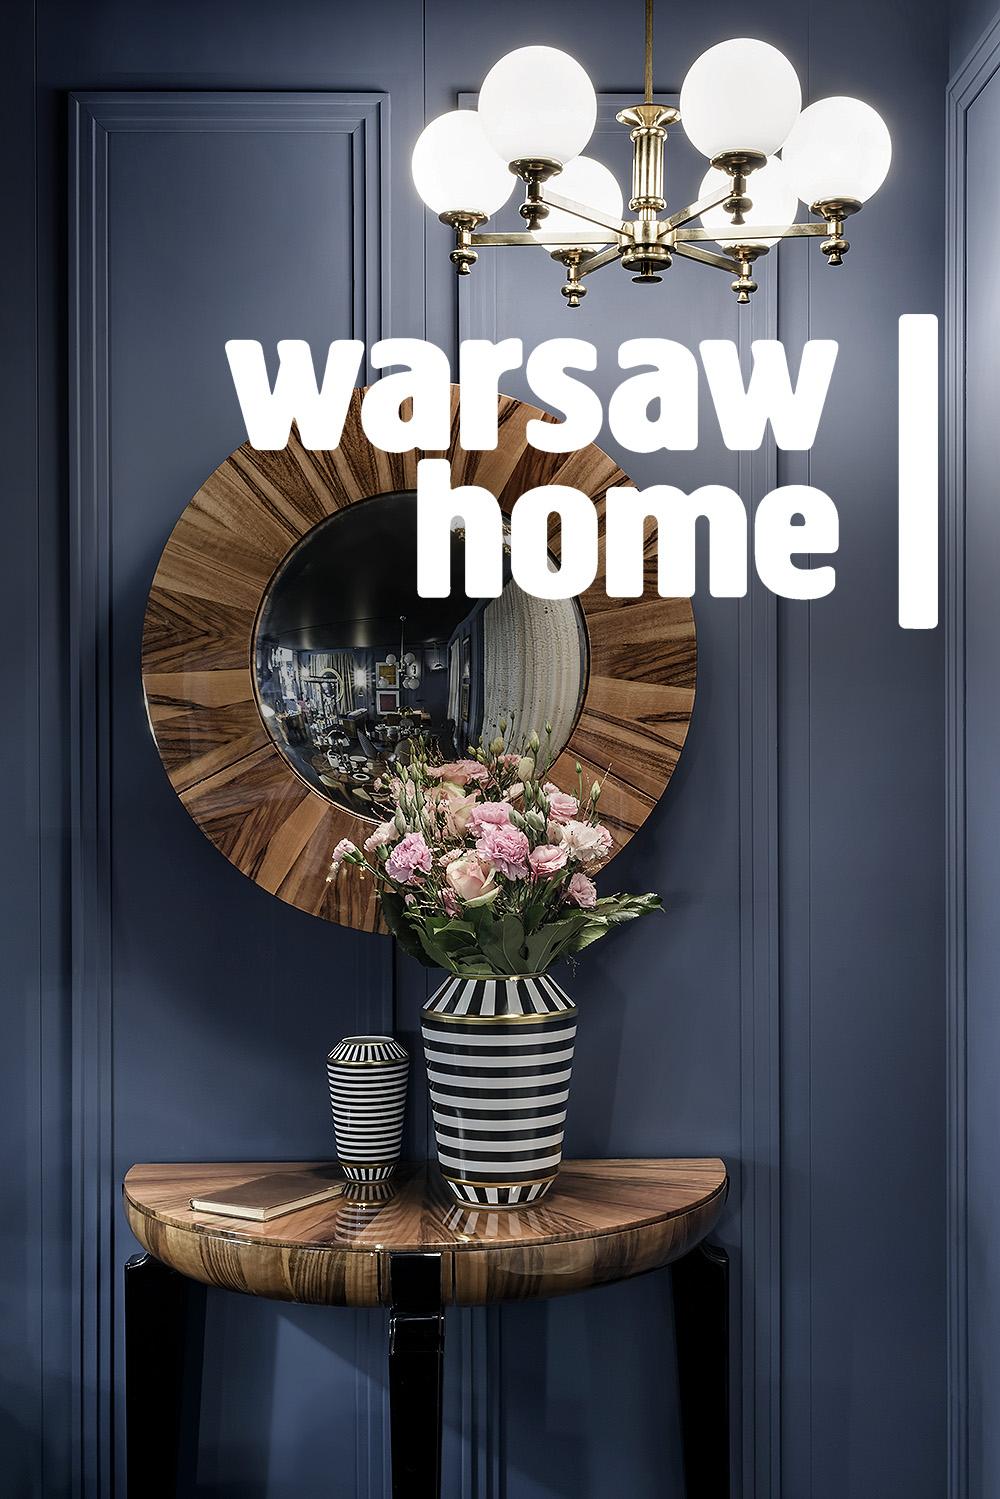 WARSAW HOME EXPO/ SEPTEMBER 2018